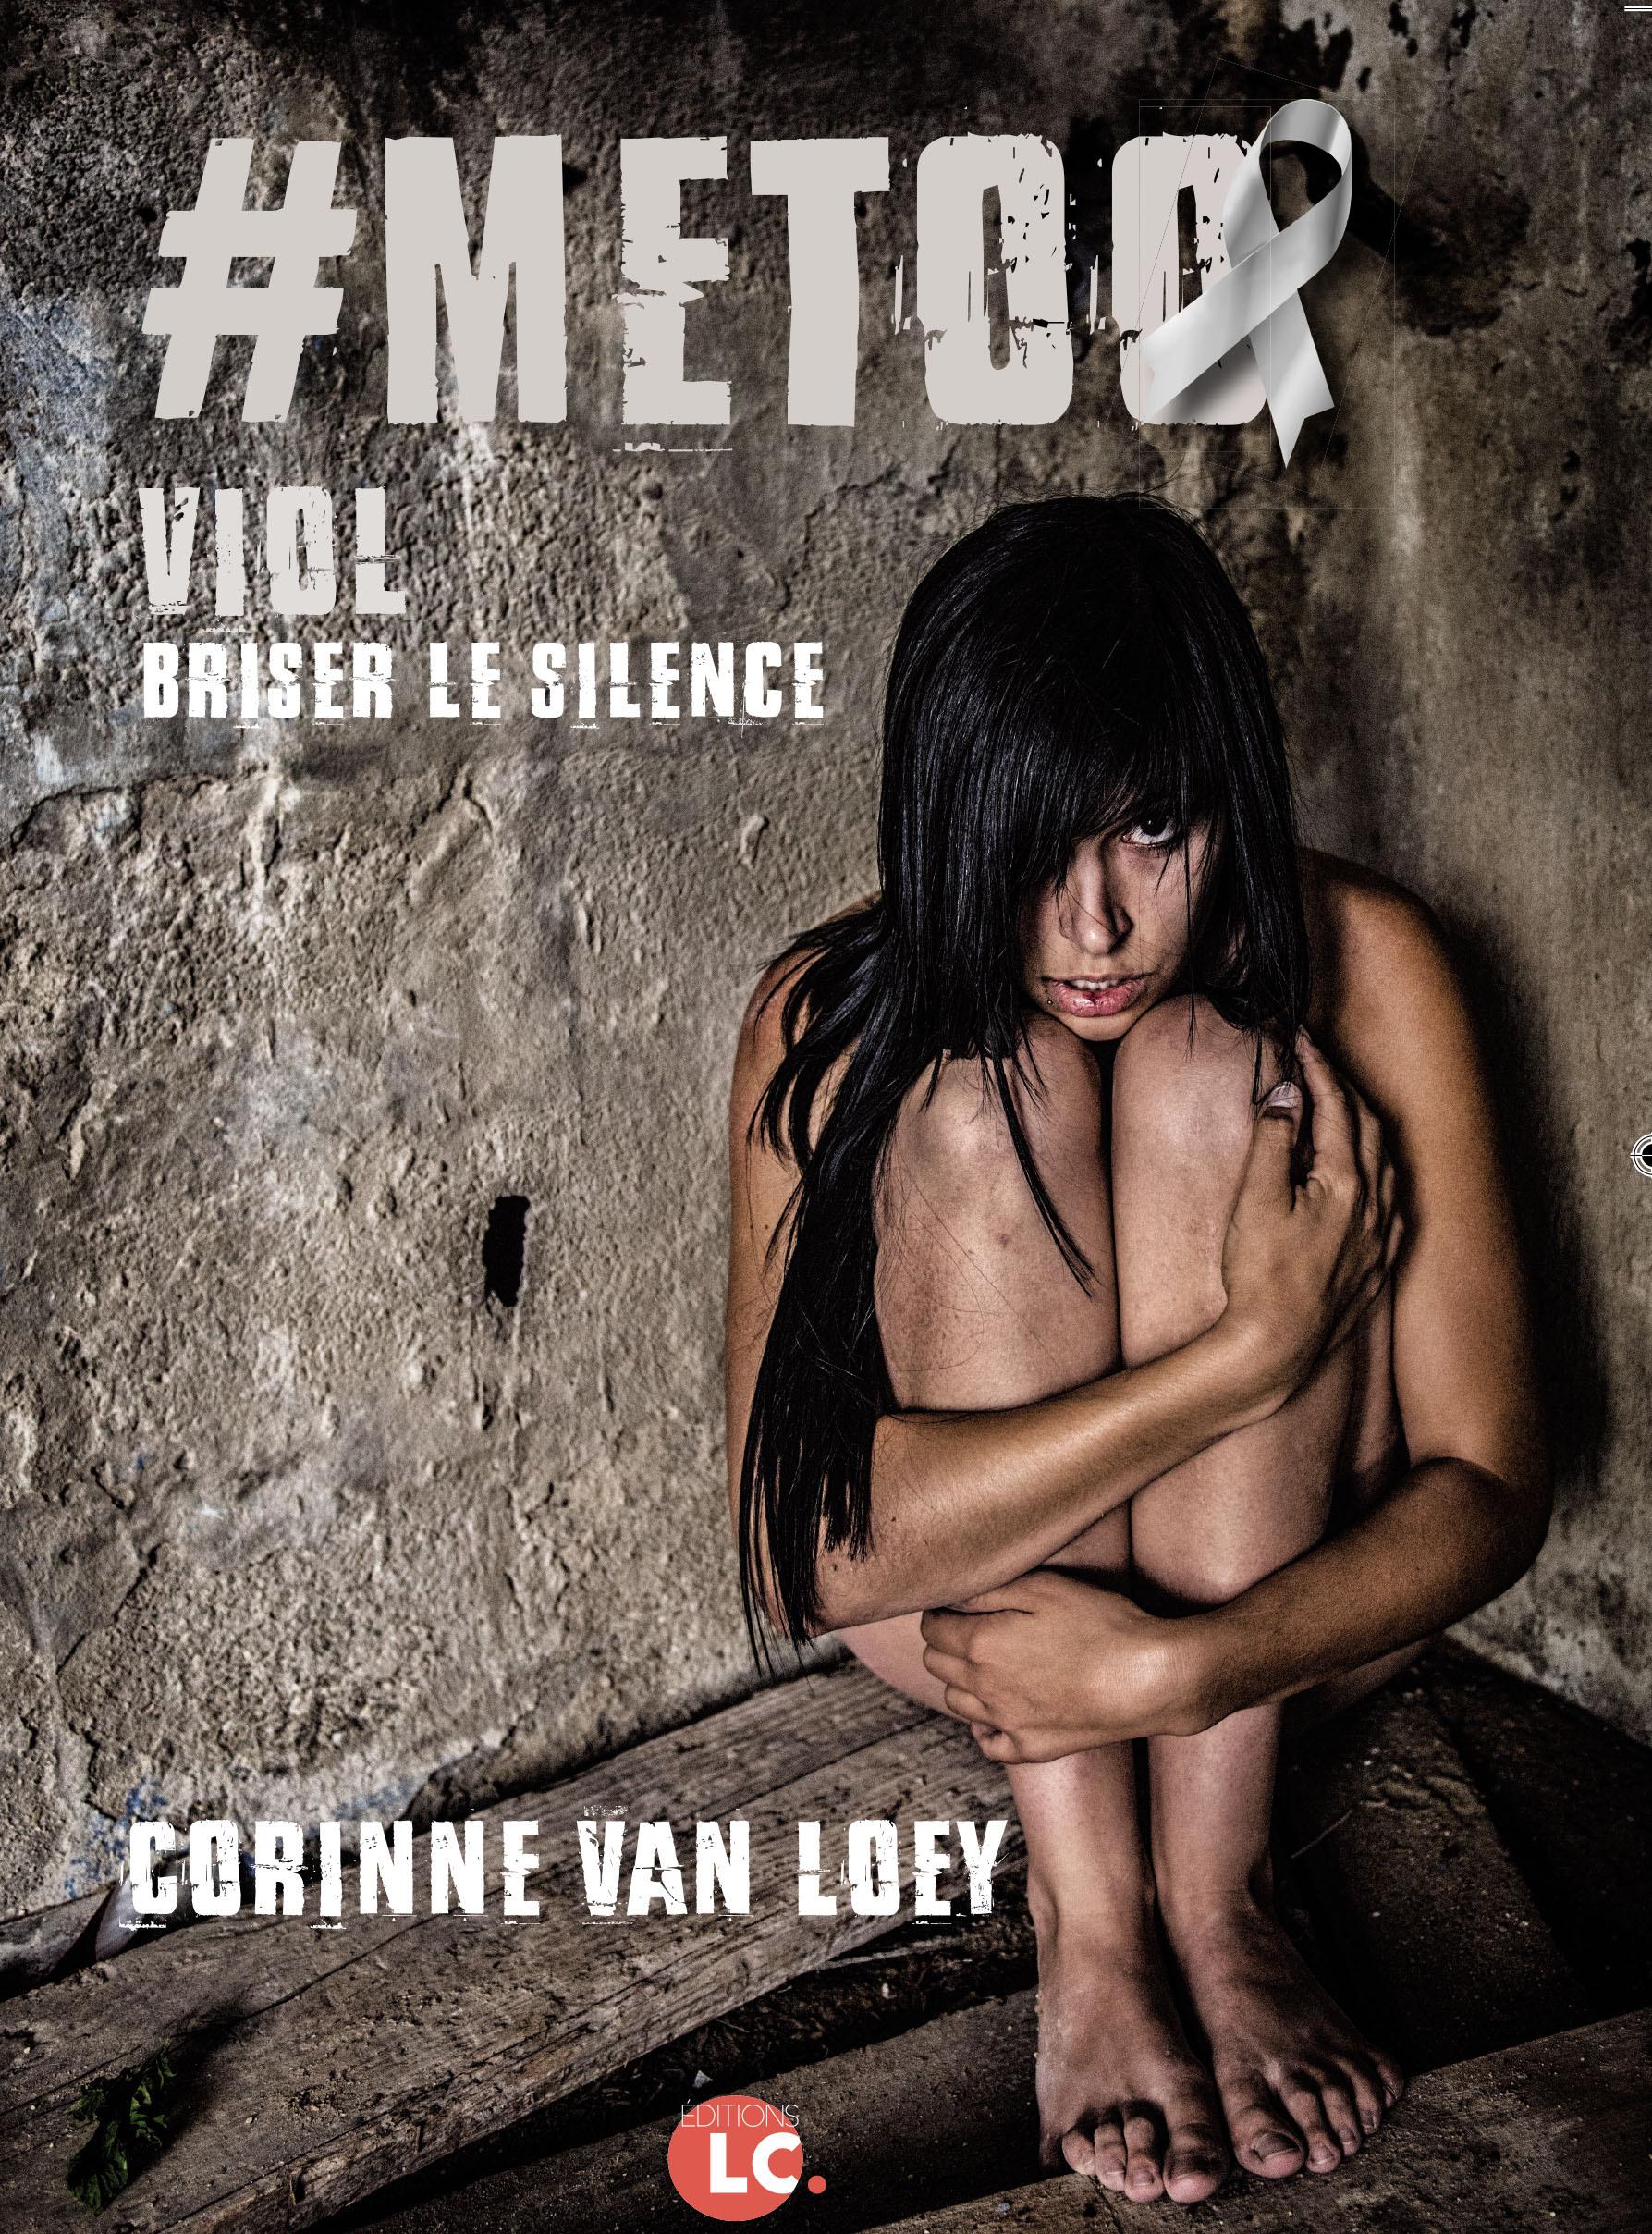 #METOO.VIOL. BRISER LE SILENCE